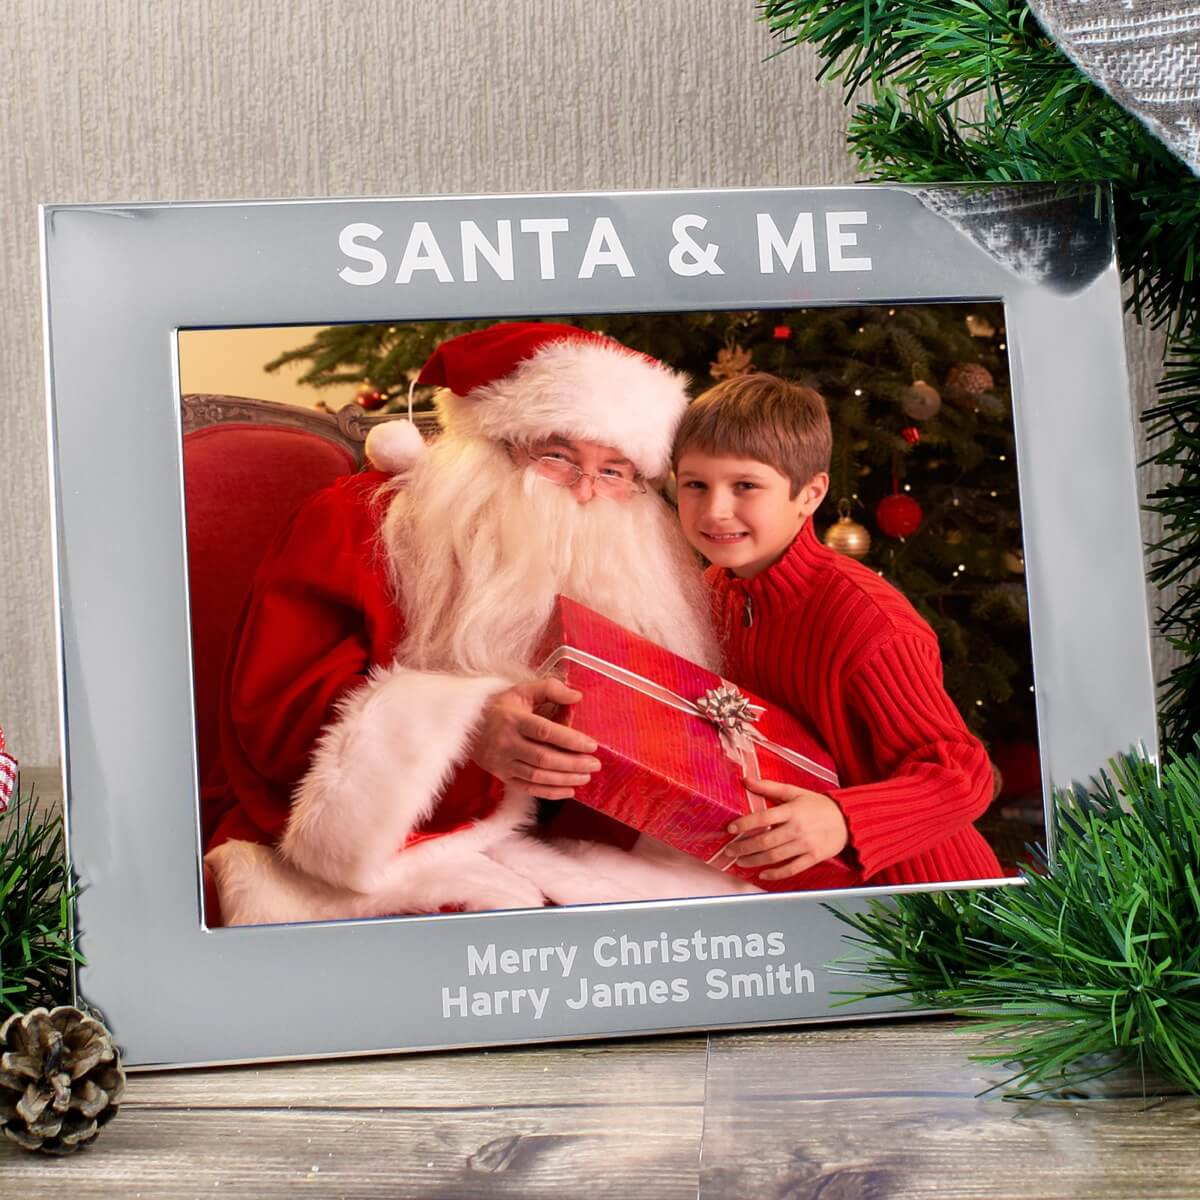 Personalised Santa & Me 7×5 Landscape Photo Frame